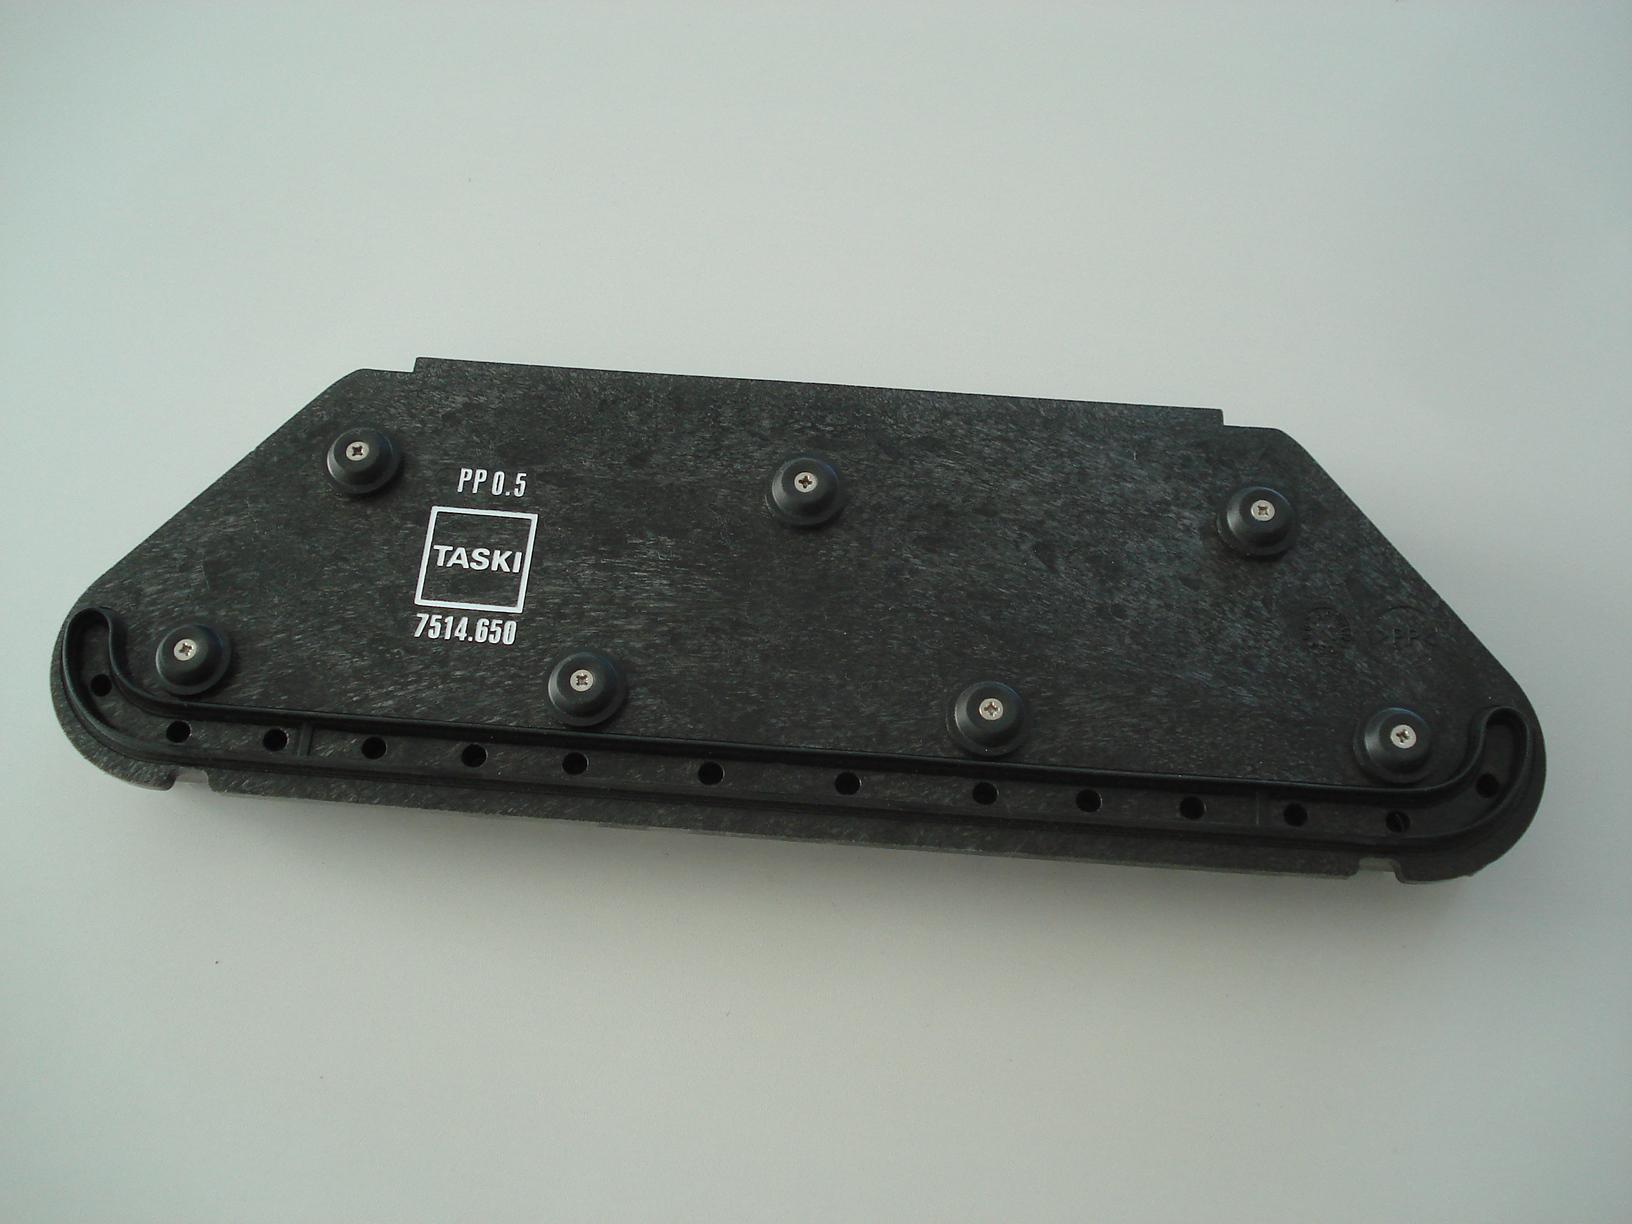 c19dea88a1 kartáč Nylon 45 cm TASKI PN 7514650